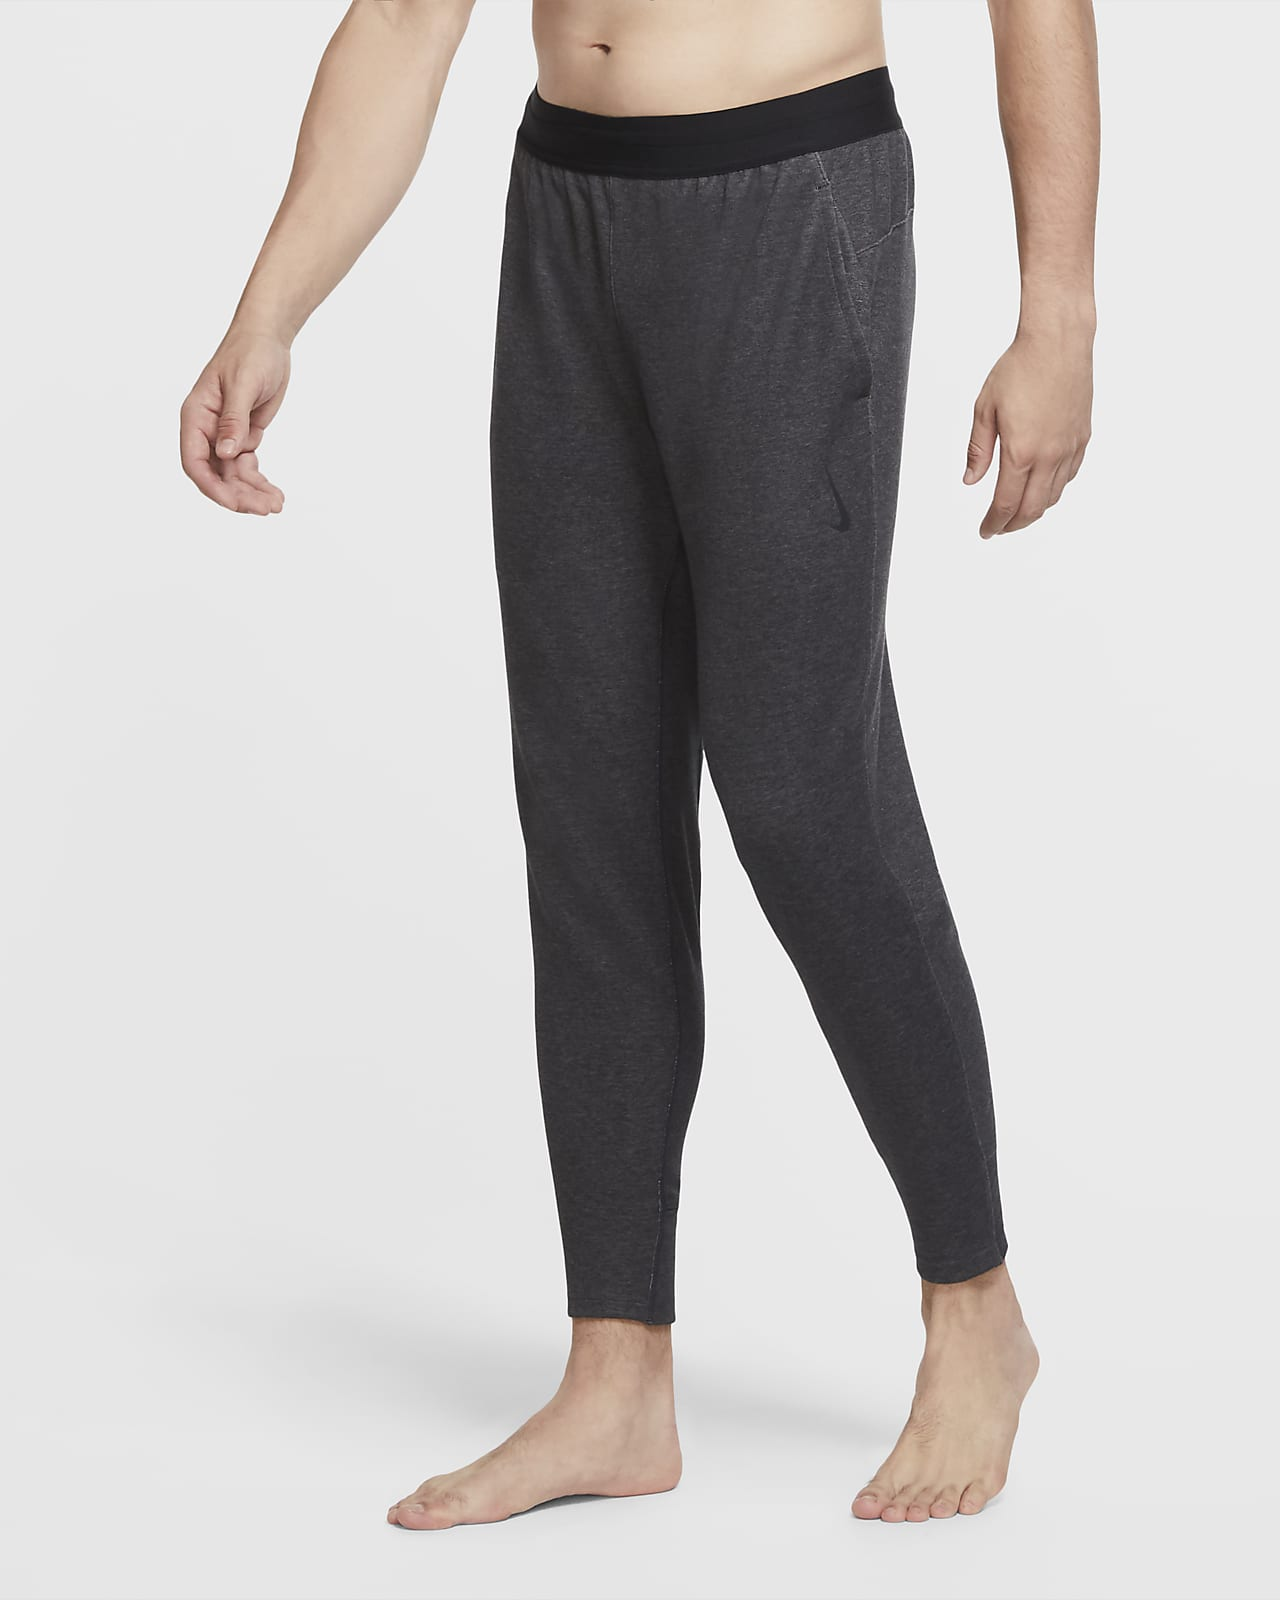 Pantalon Nike Yoga pour Homme